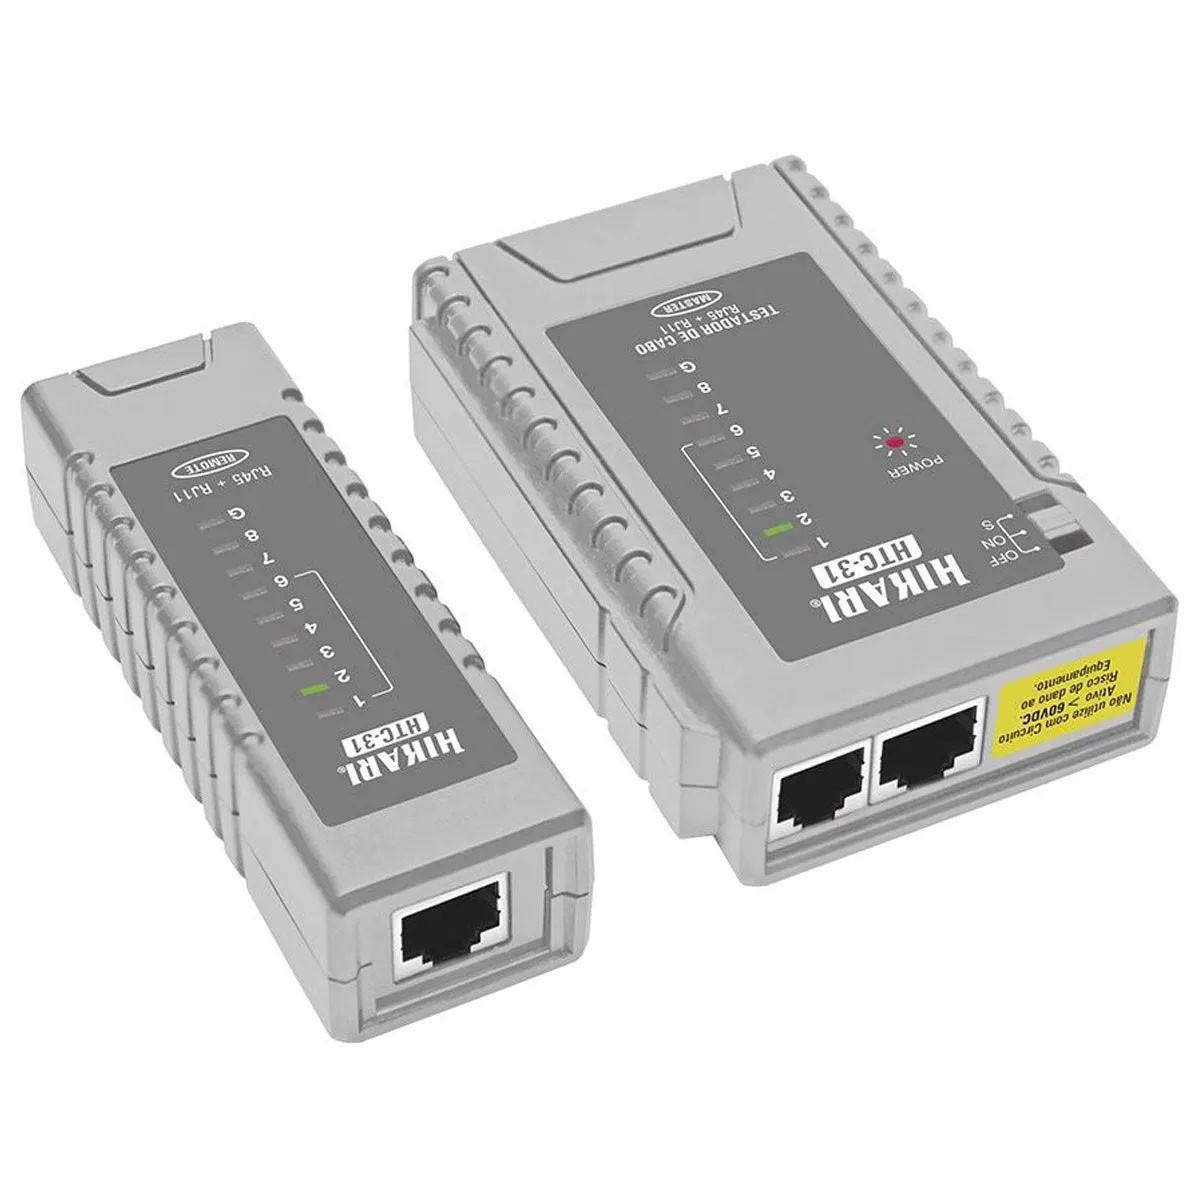 Kit Ethernet Iniciante: Testador de Cabo + Alicate Clipador + 10x RJ45 Macho